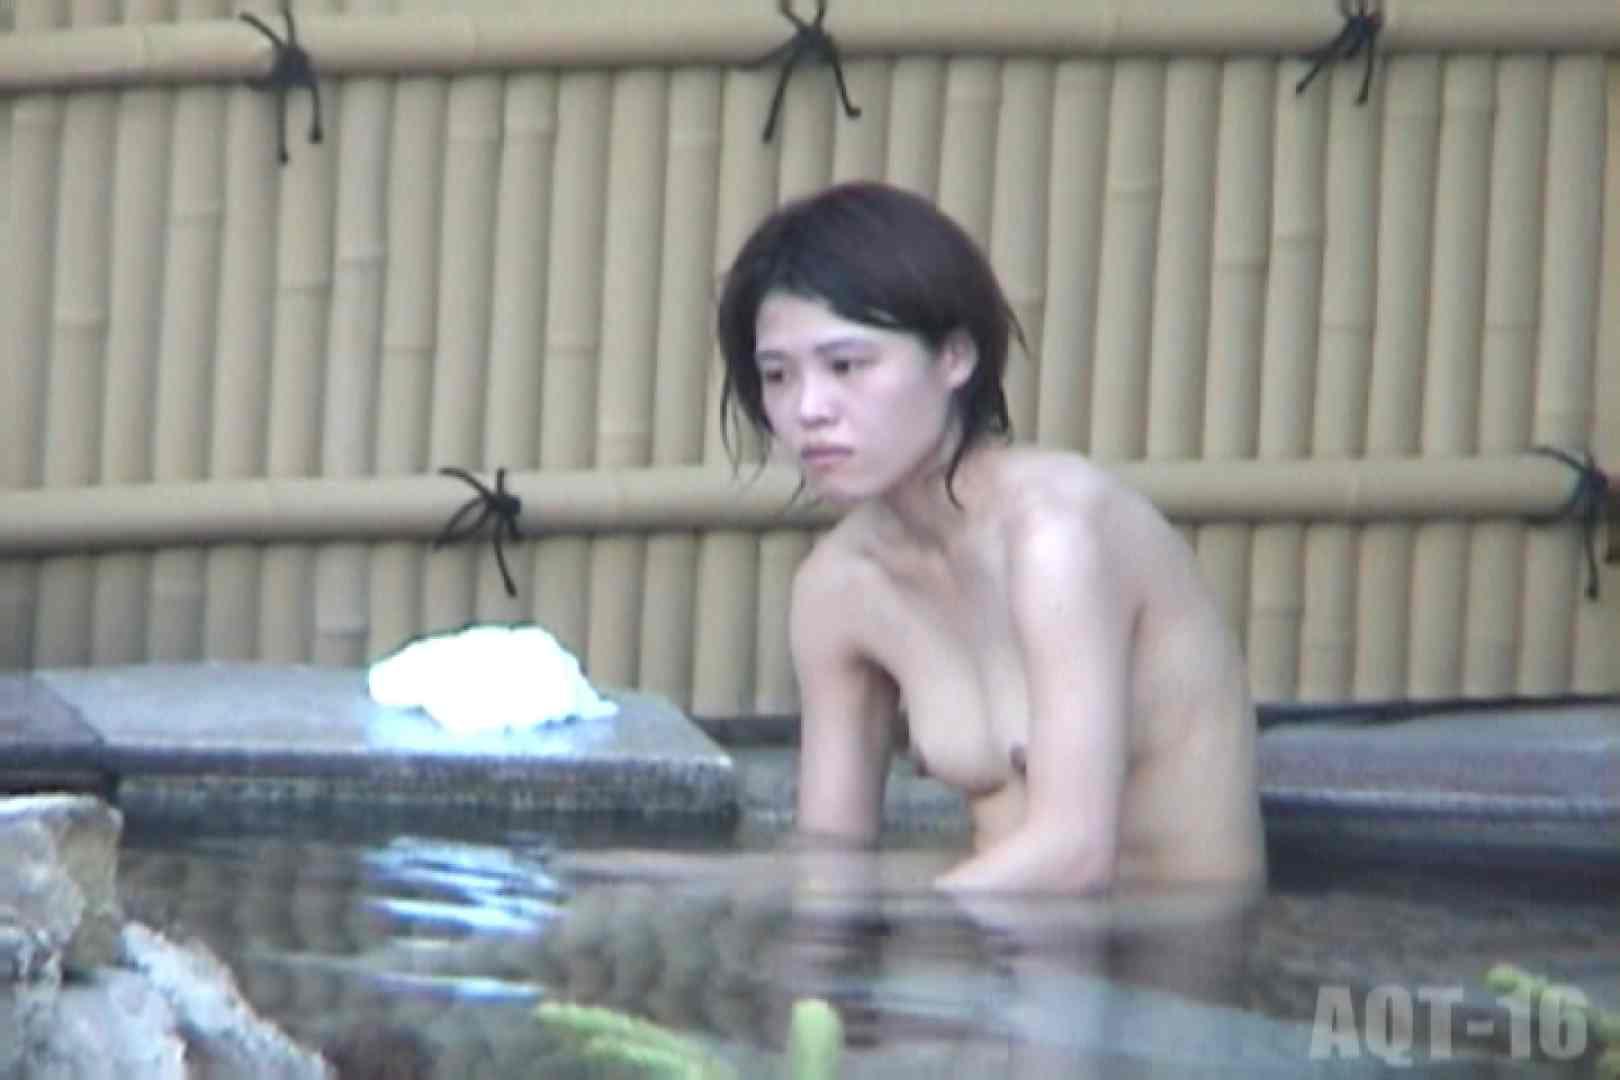 Aquaな露天風呂Vol.843 盗撮大放出 スケベ動画紹介 66連発 31